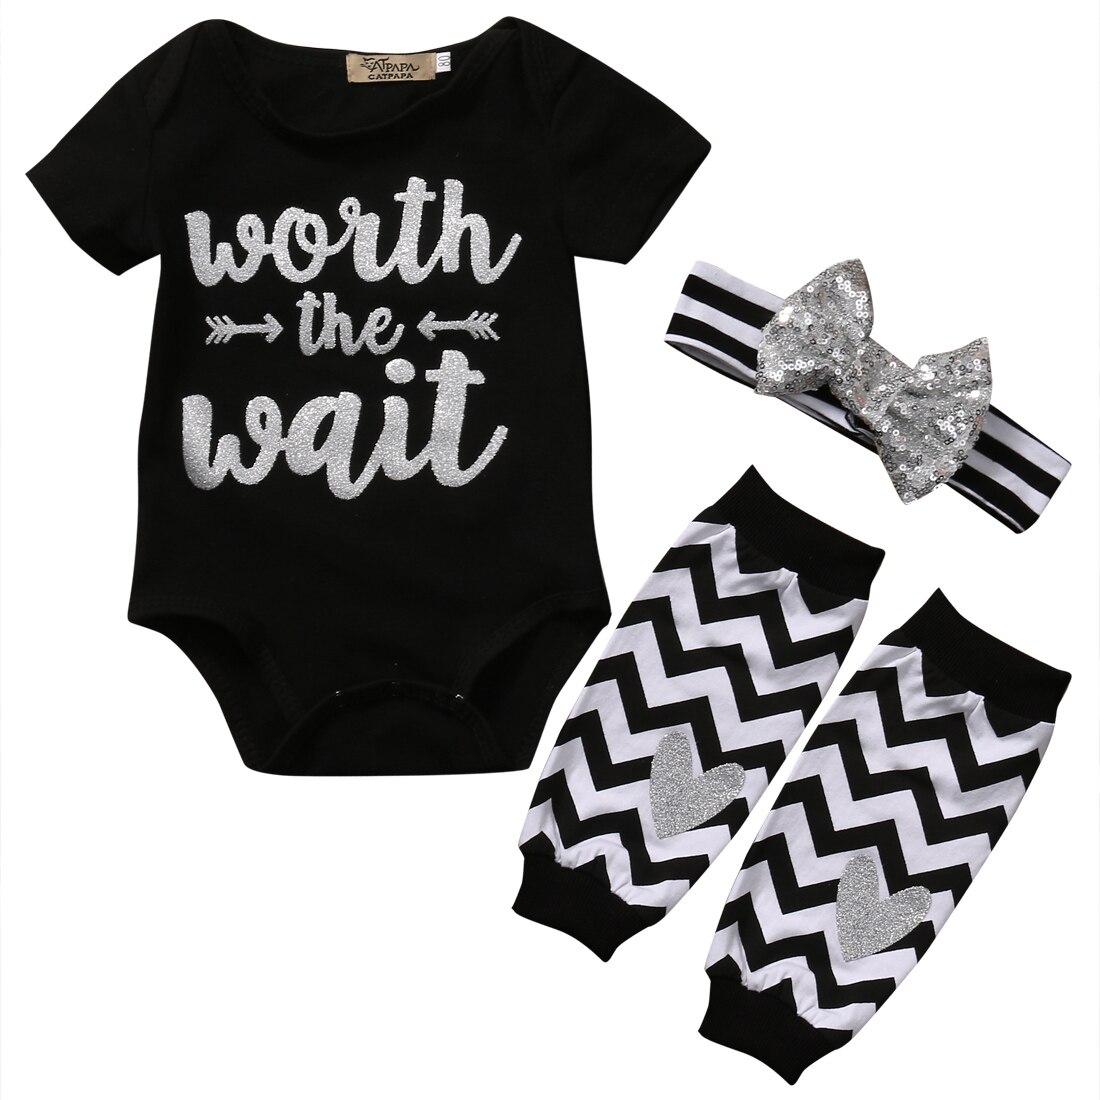 3PCS Set Newborn Baby Boy Girl Clothes Worth the Wait Baby Romper Bodysuit +Leg Warmer Headband Outfit Bebek Giyim Children Suit  недорого